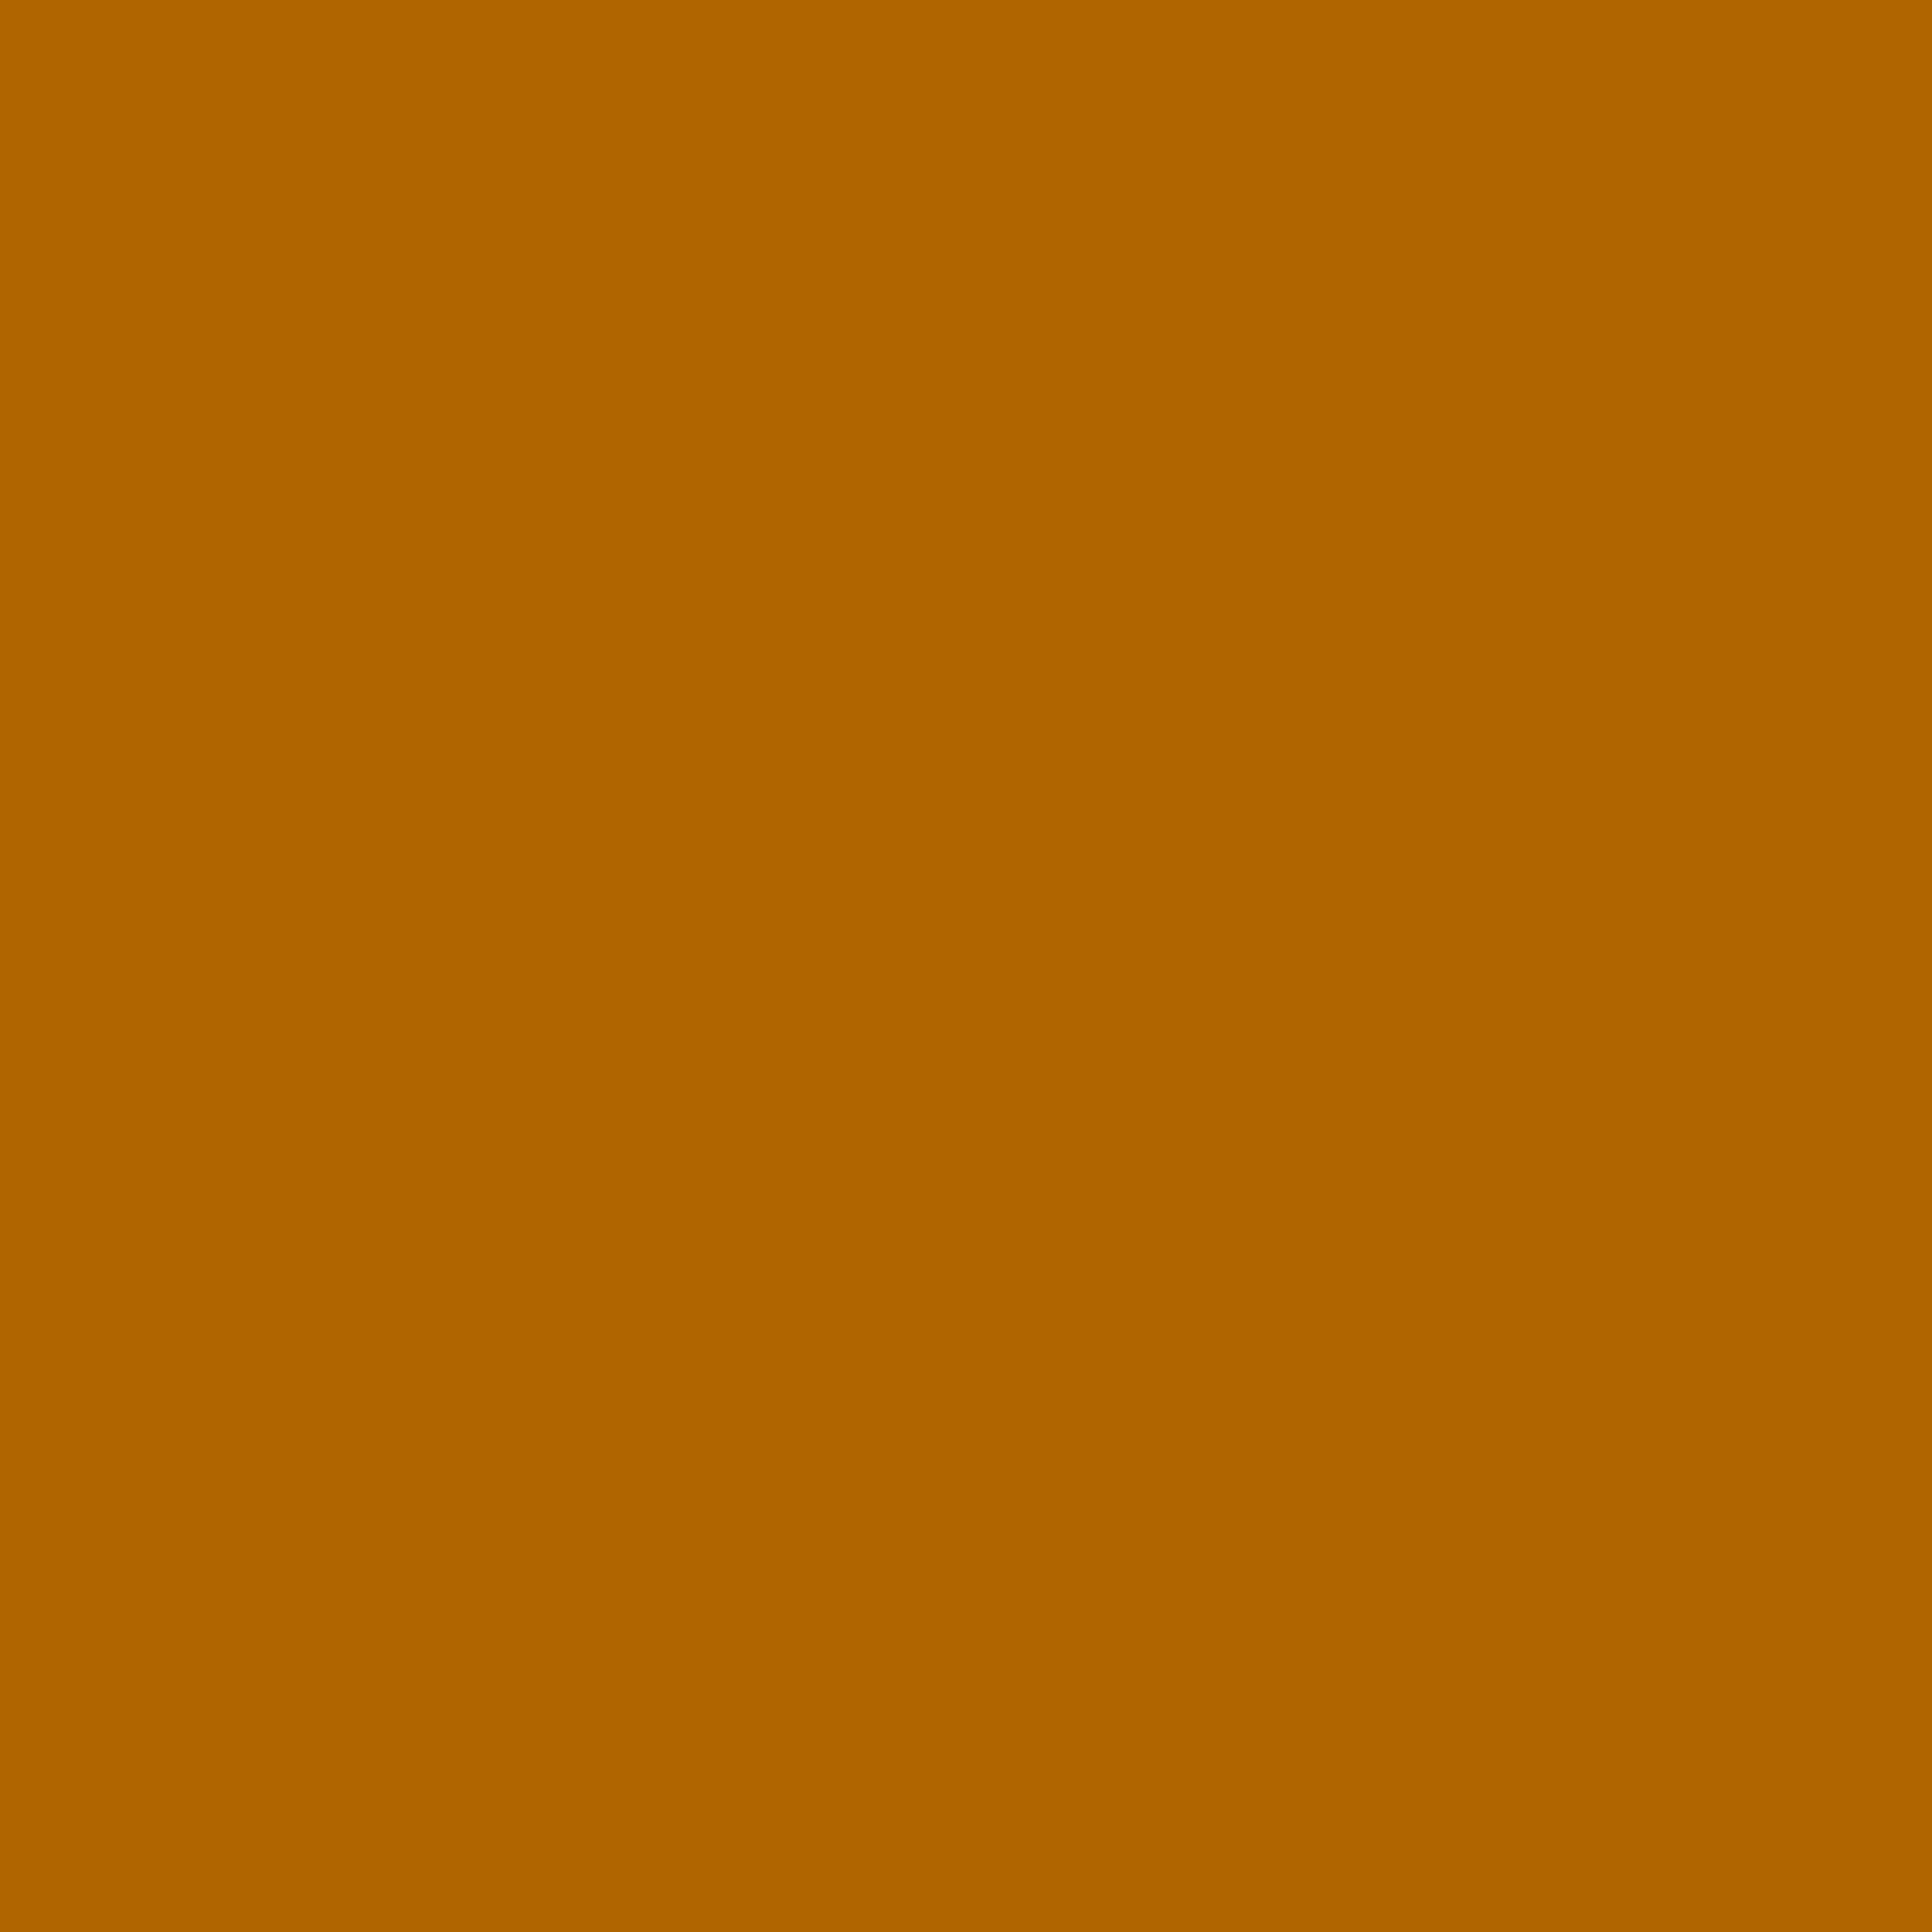 3600x3600 Ginger Solid Color Background